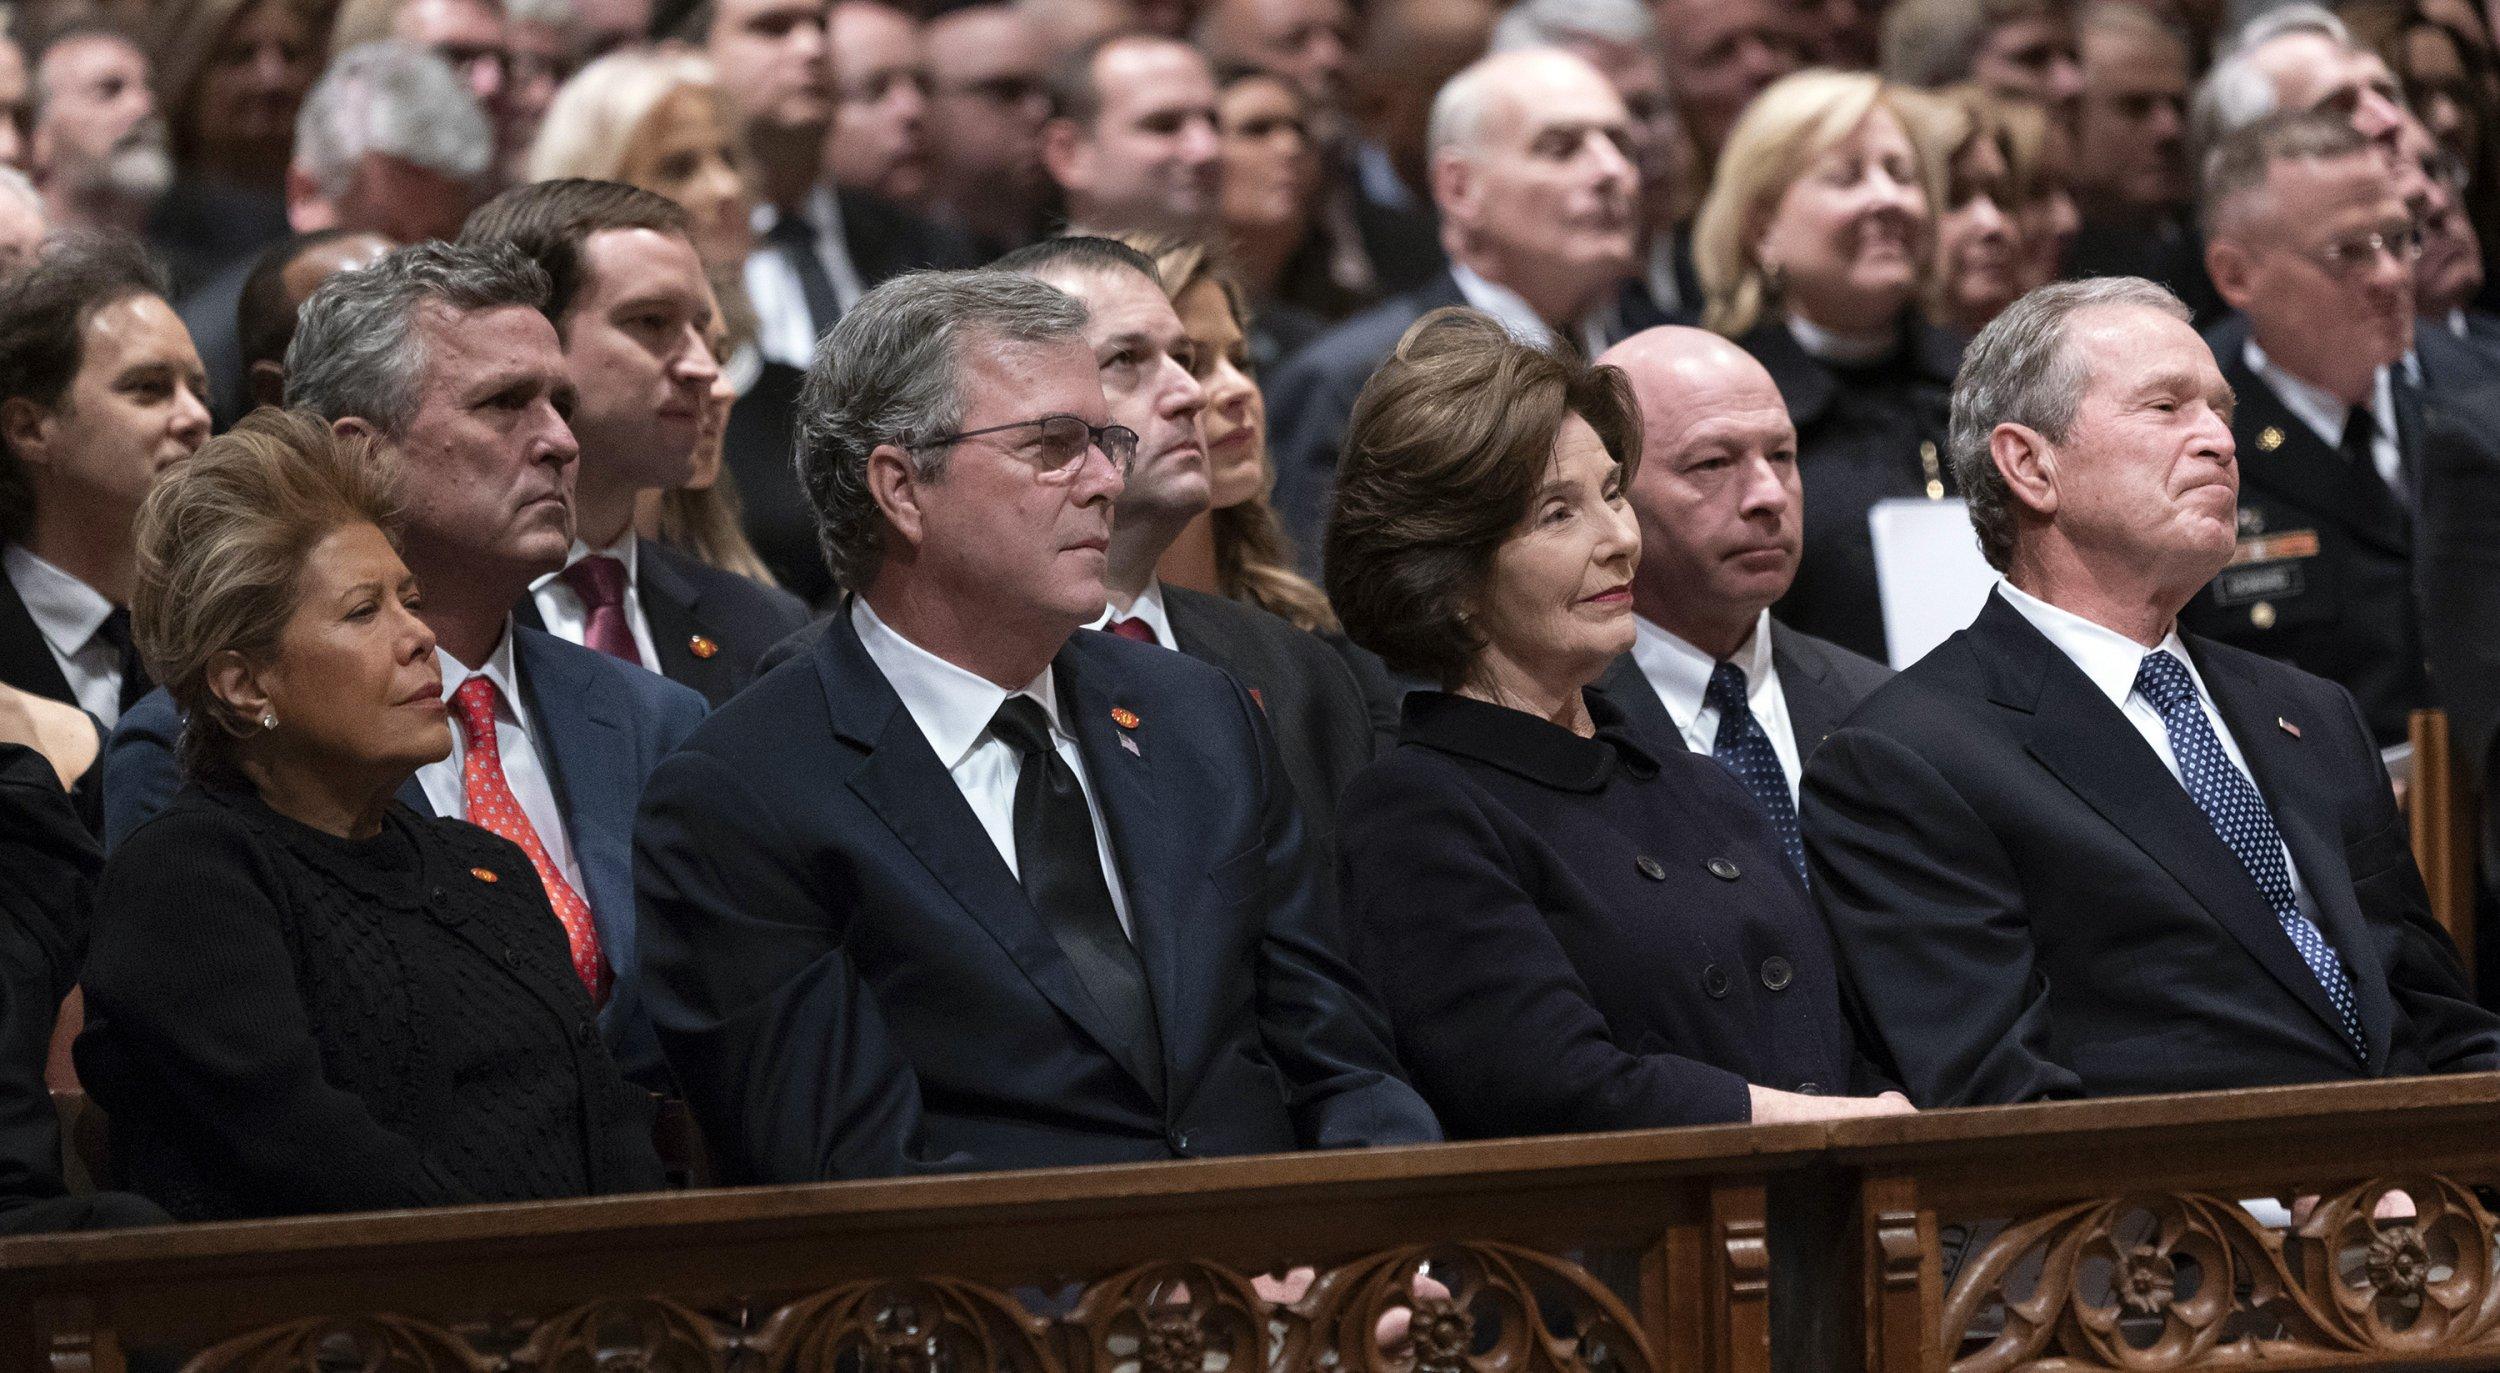 George and Jeb Bush